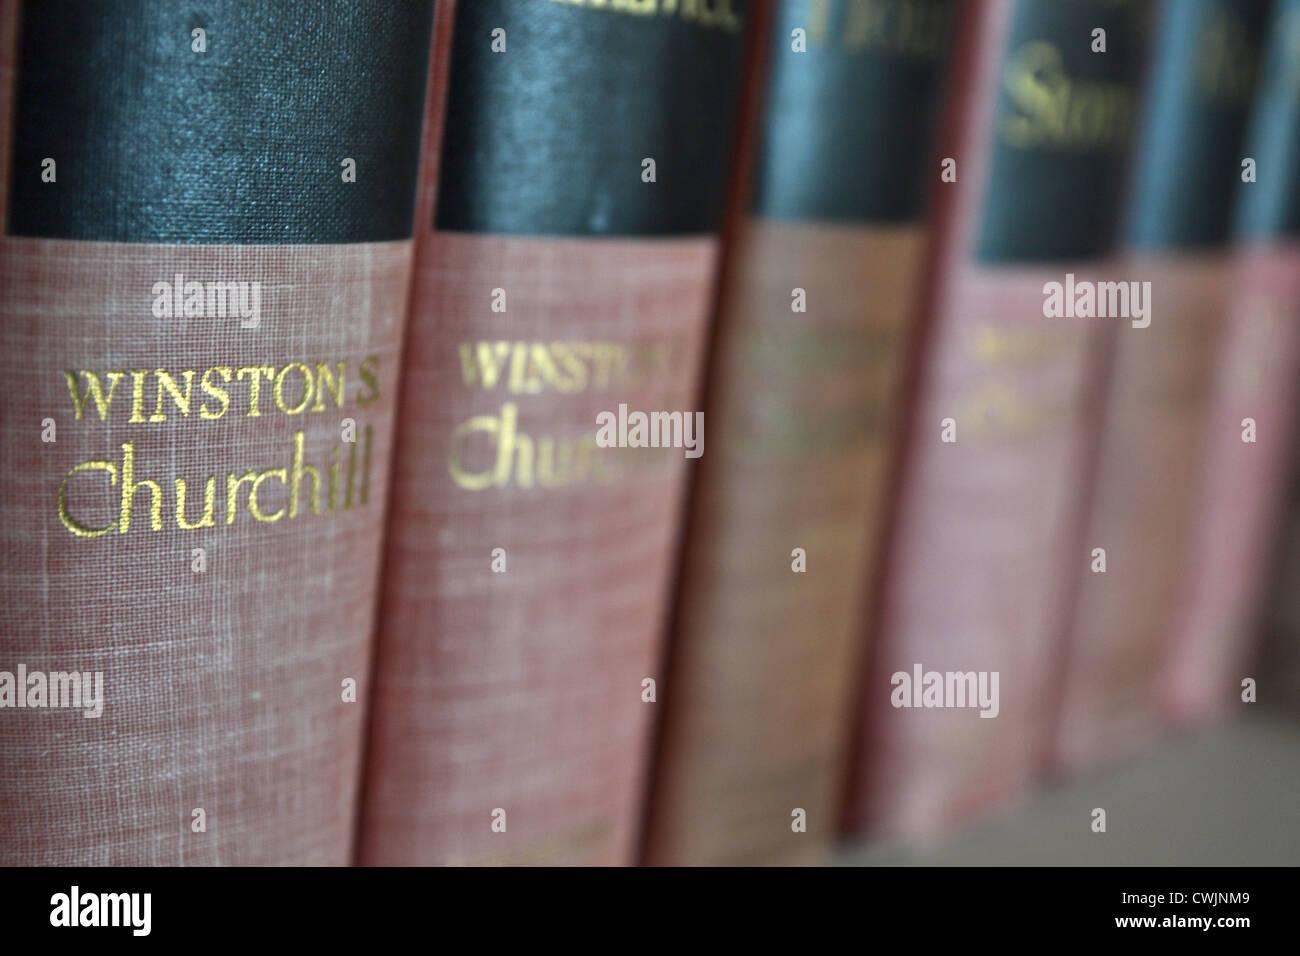 Vintage Winston Churchill Books Stock Photo